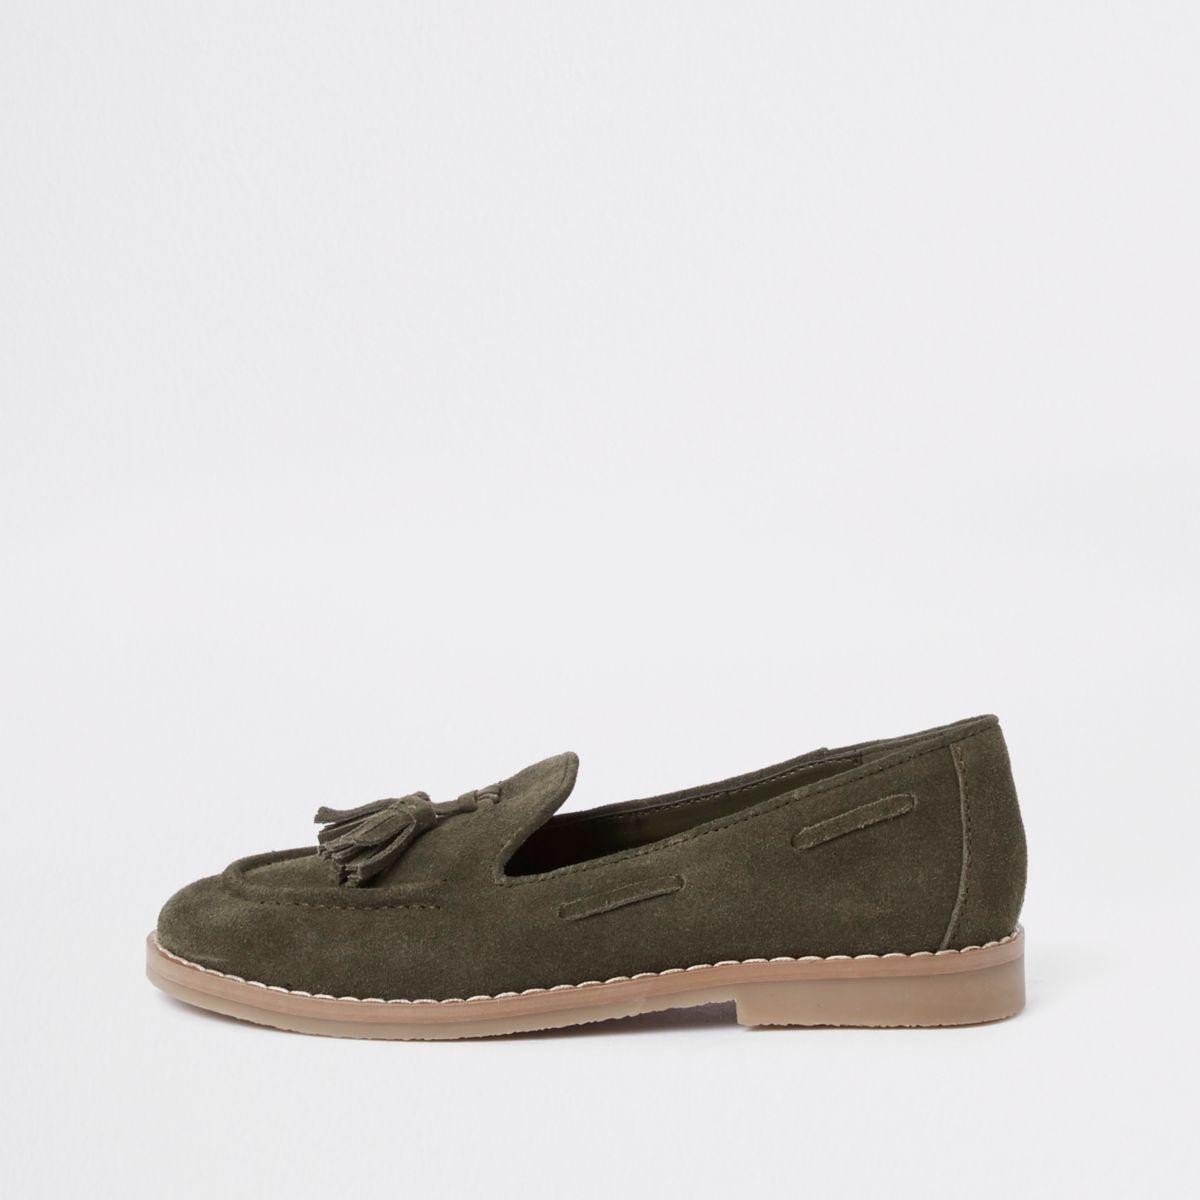 Boys khaki tassel loafers